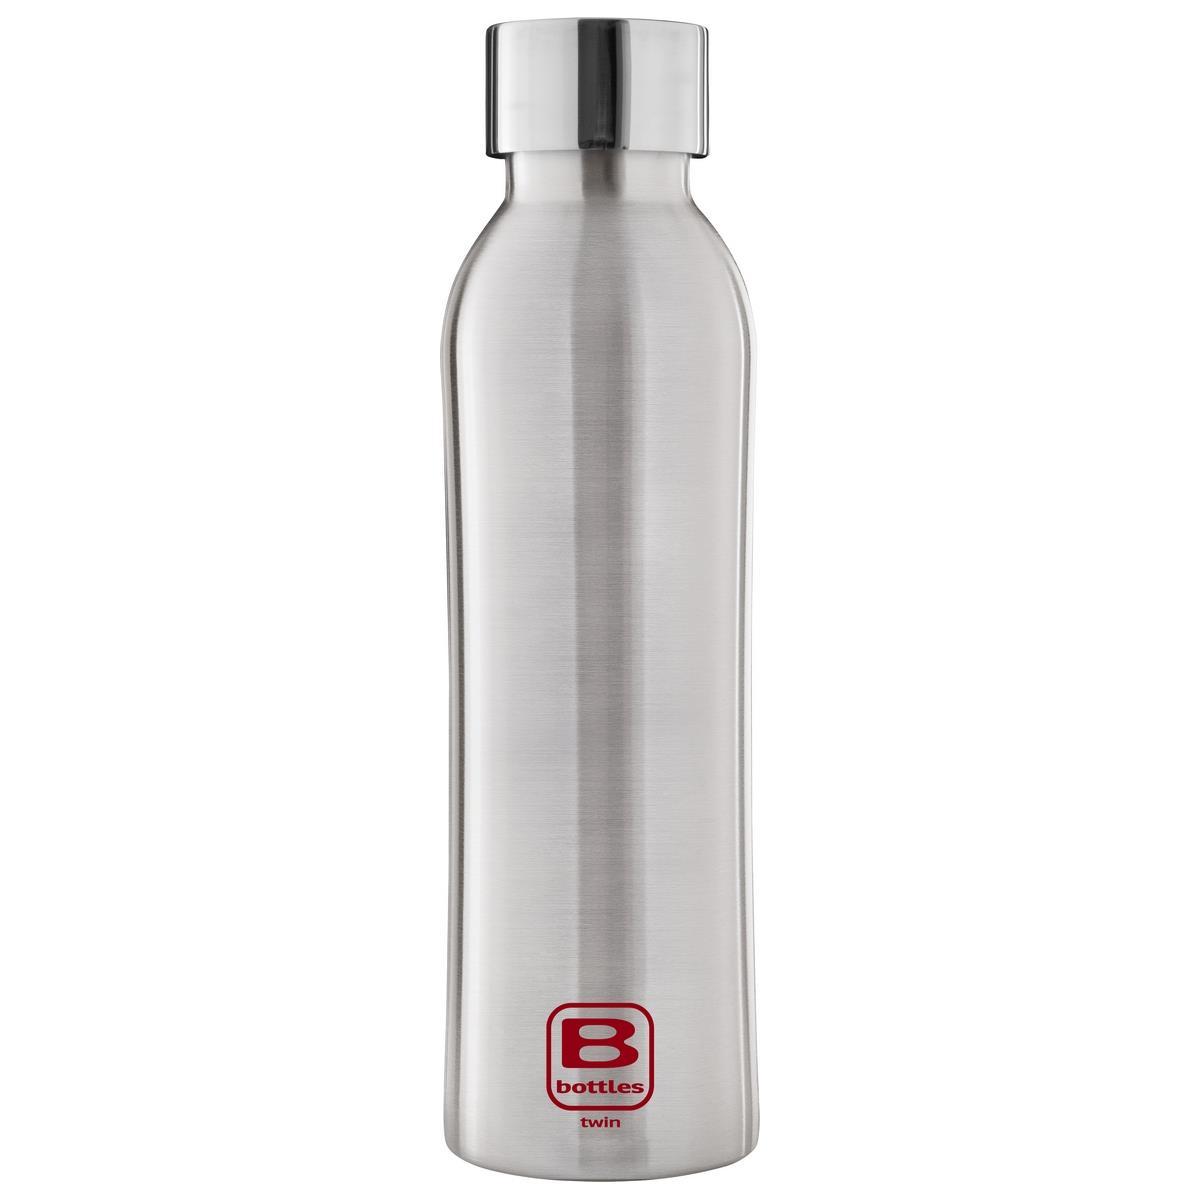 B Bottles Twin - Steel Brushed - 500 ml - Bottiglia Termica a doppia parete in acciaio inox 18/10